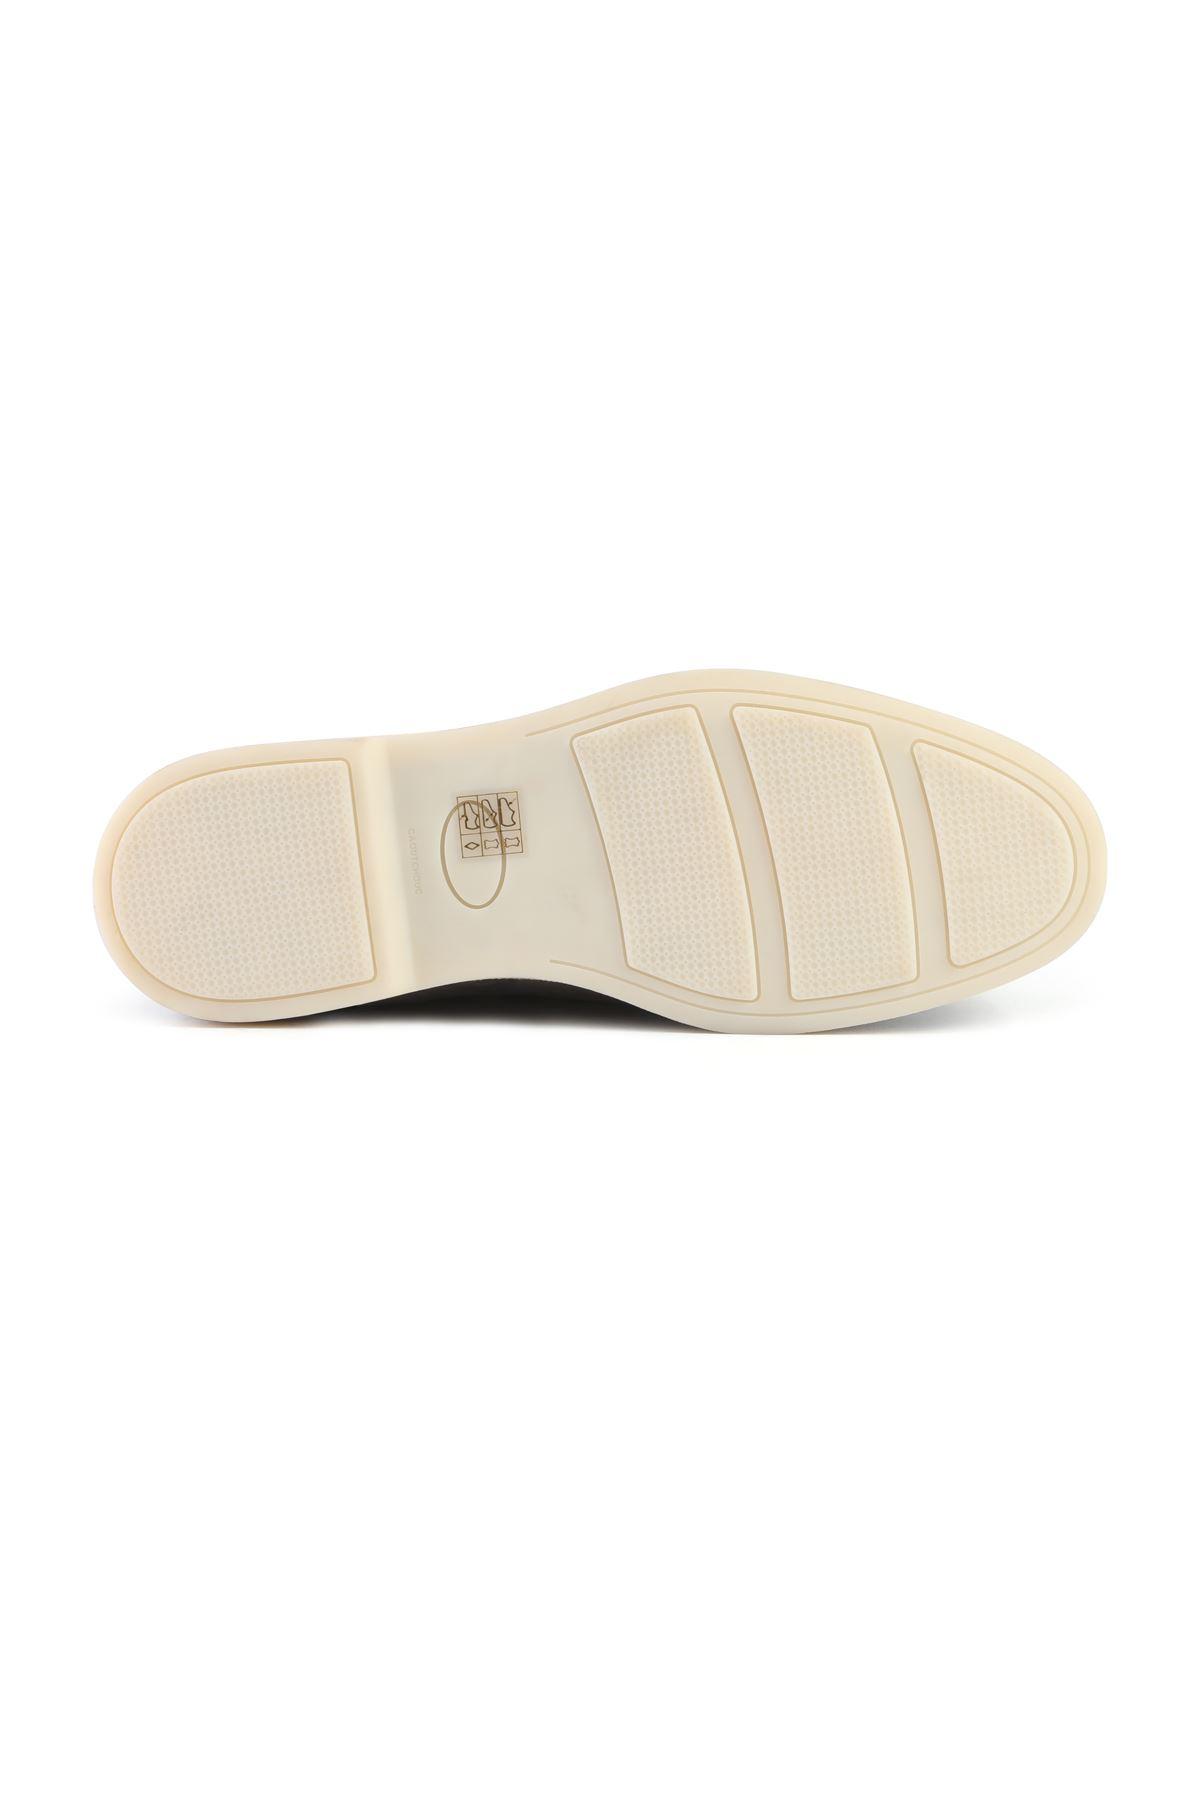 Libero L3215 Mink Loafer Shoes